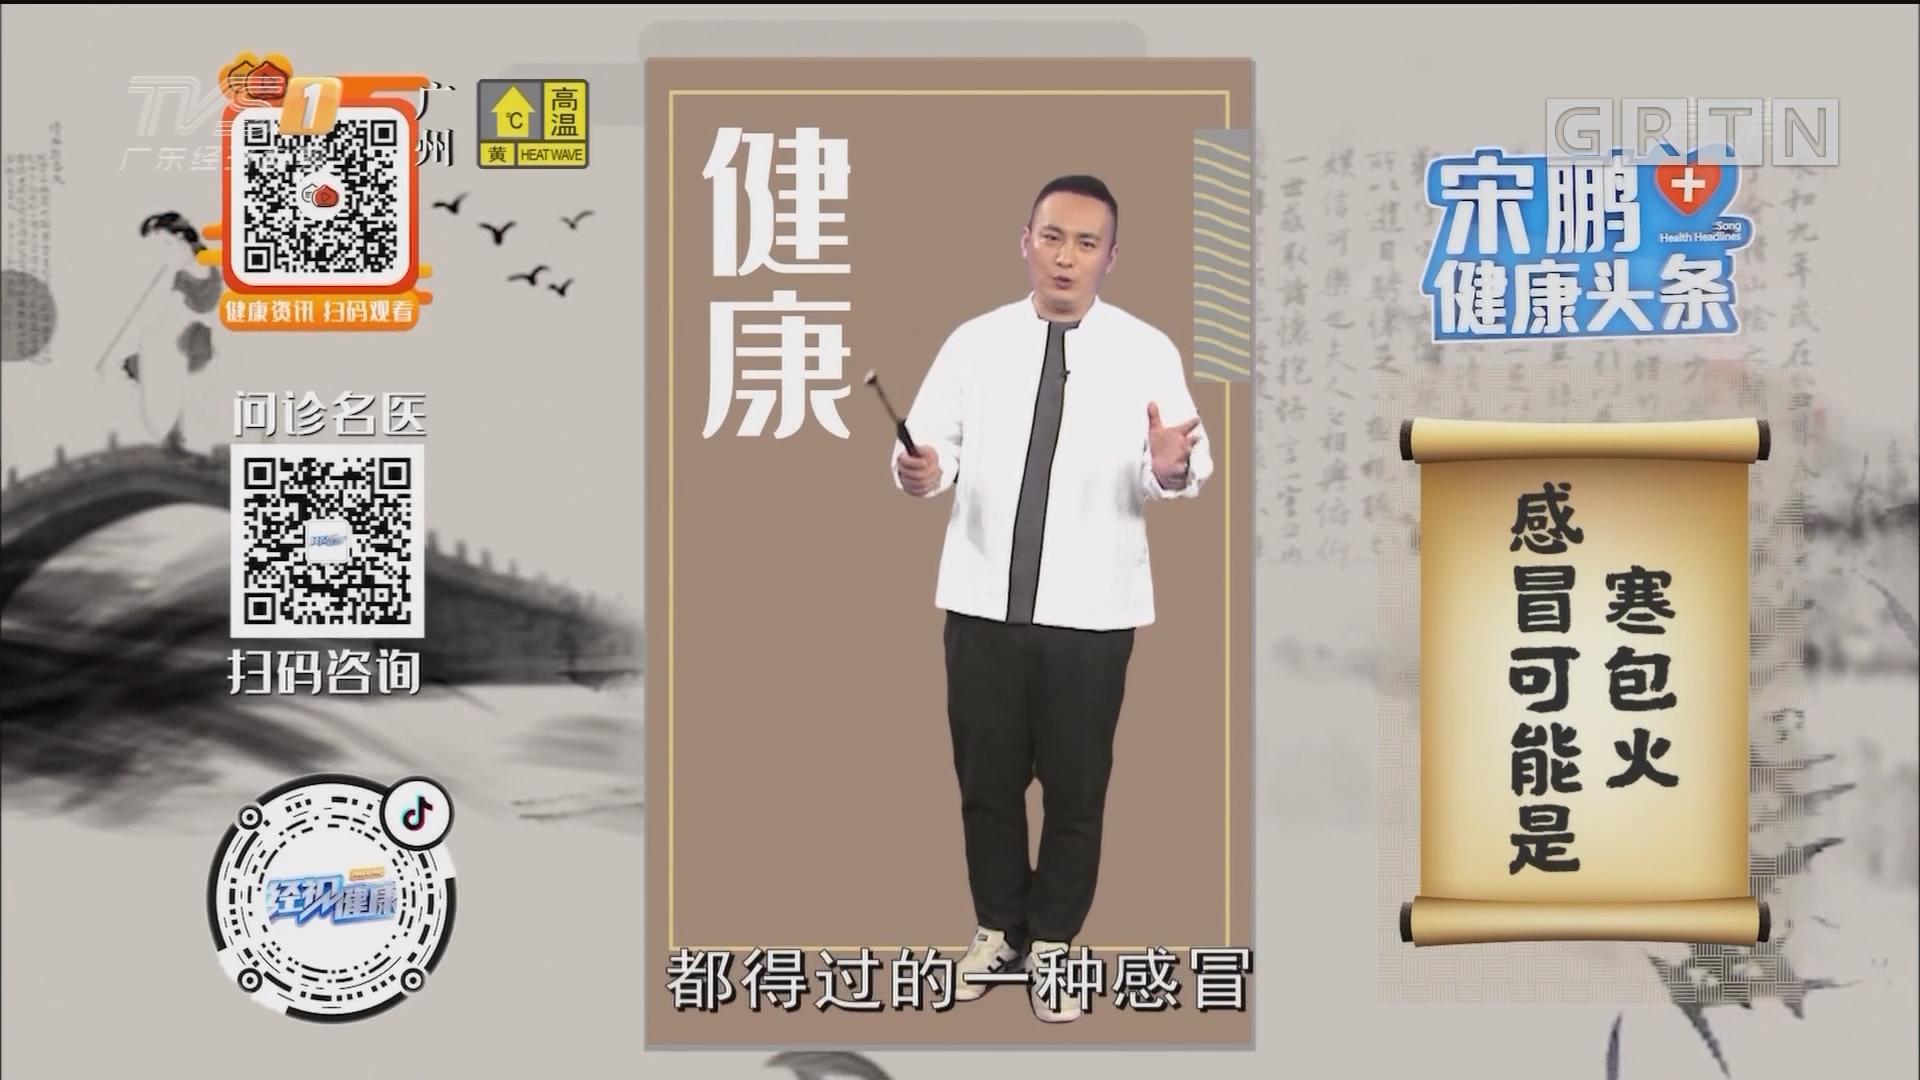 [HD][2019-09-09]经视健康+:宋鹏健康头条:感冒可能是寒包火